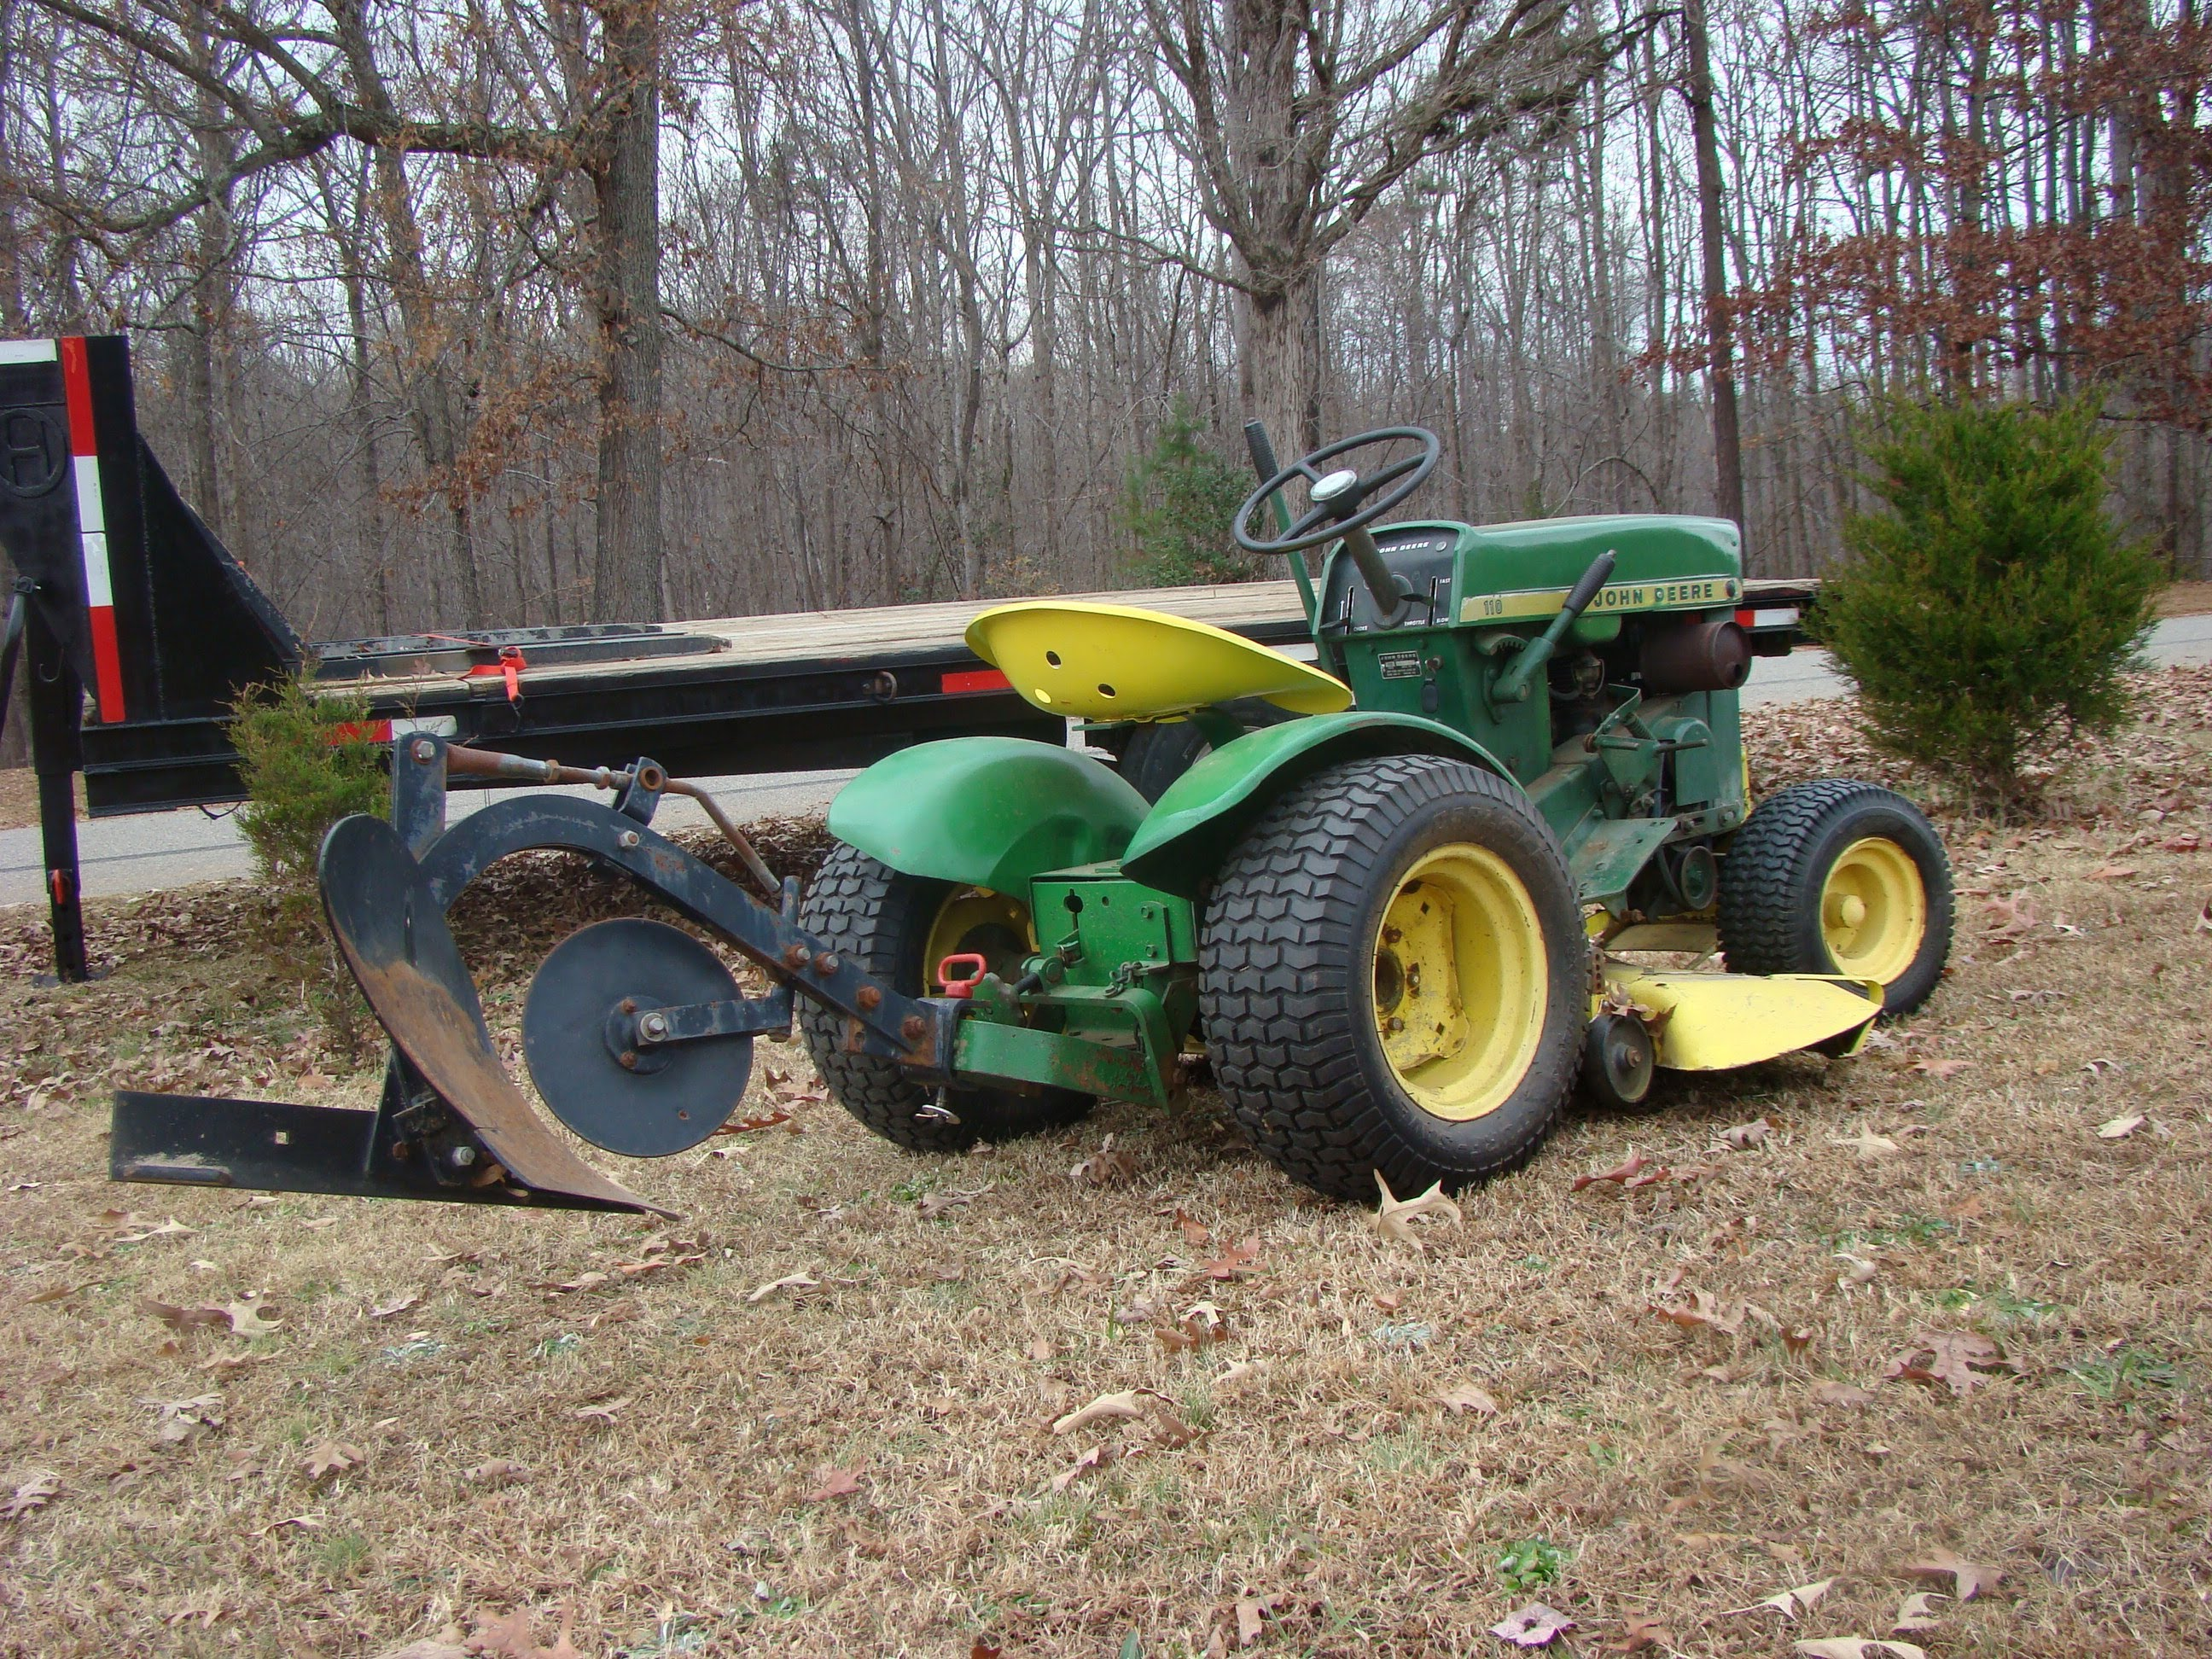 John Deere 110 Garden Tractor Attachments : John deere attachments